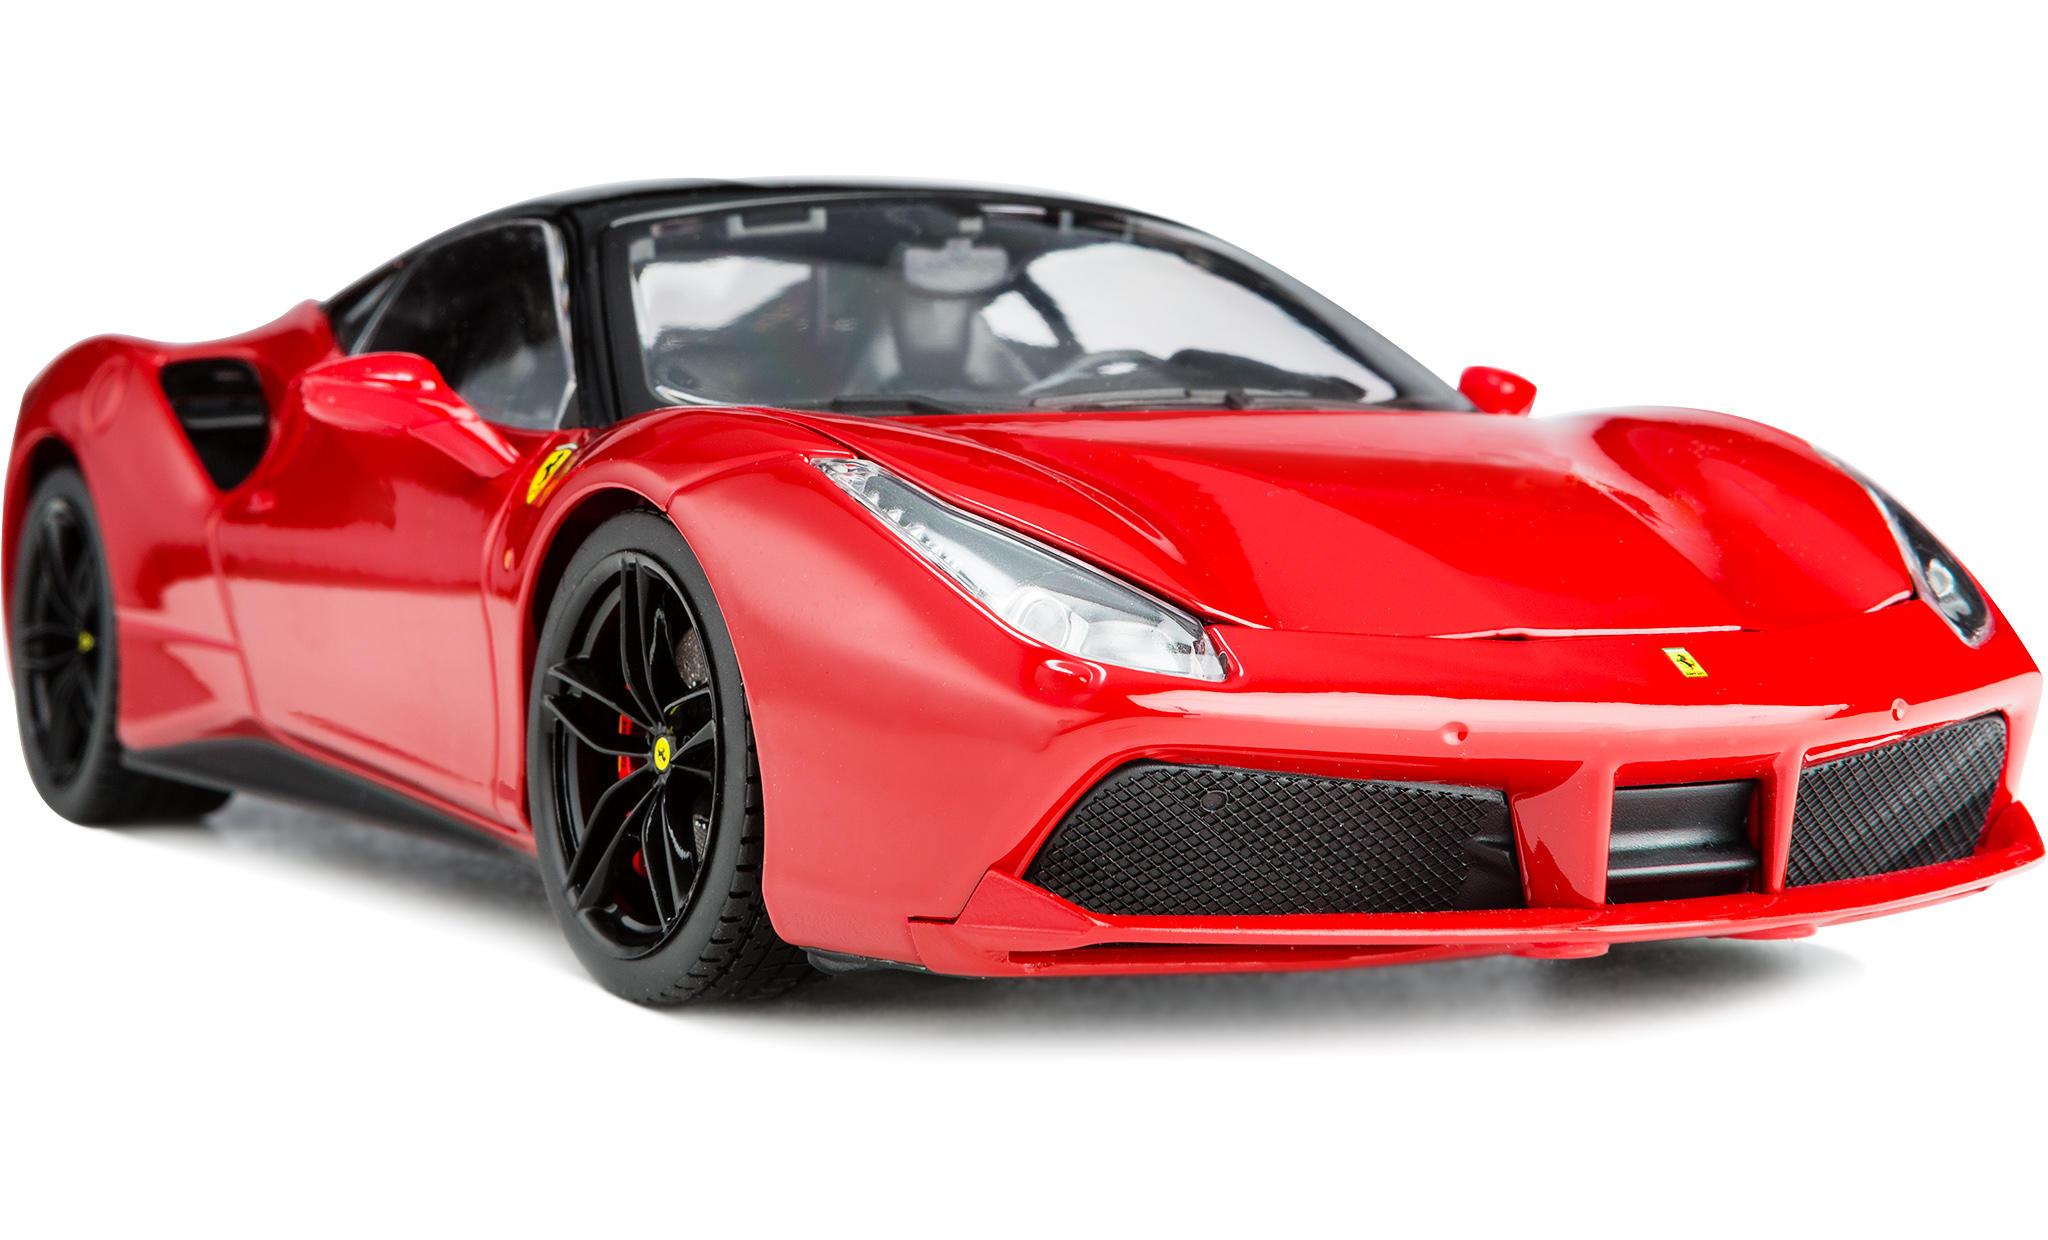 Captivating Ferrari 488 GTB Bburago Signature Series Diecast Model Car